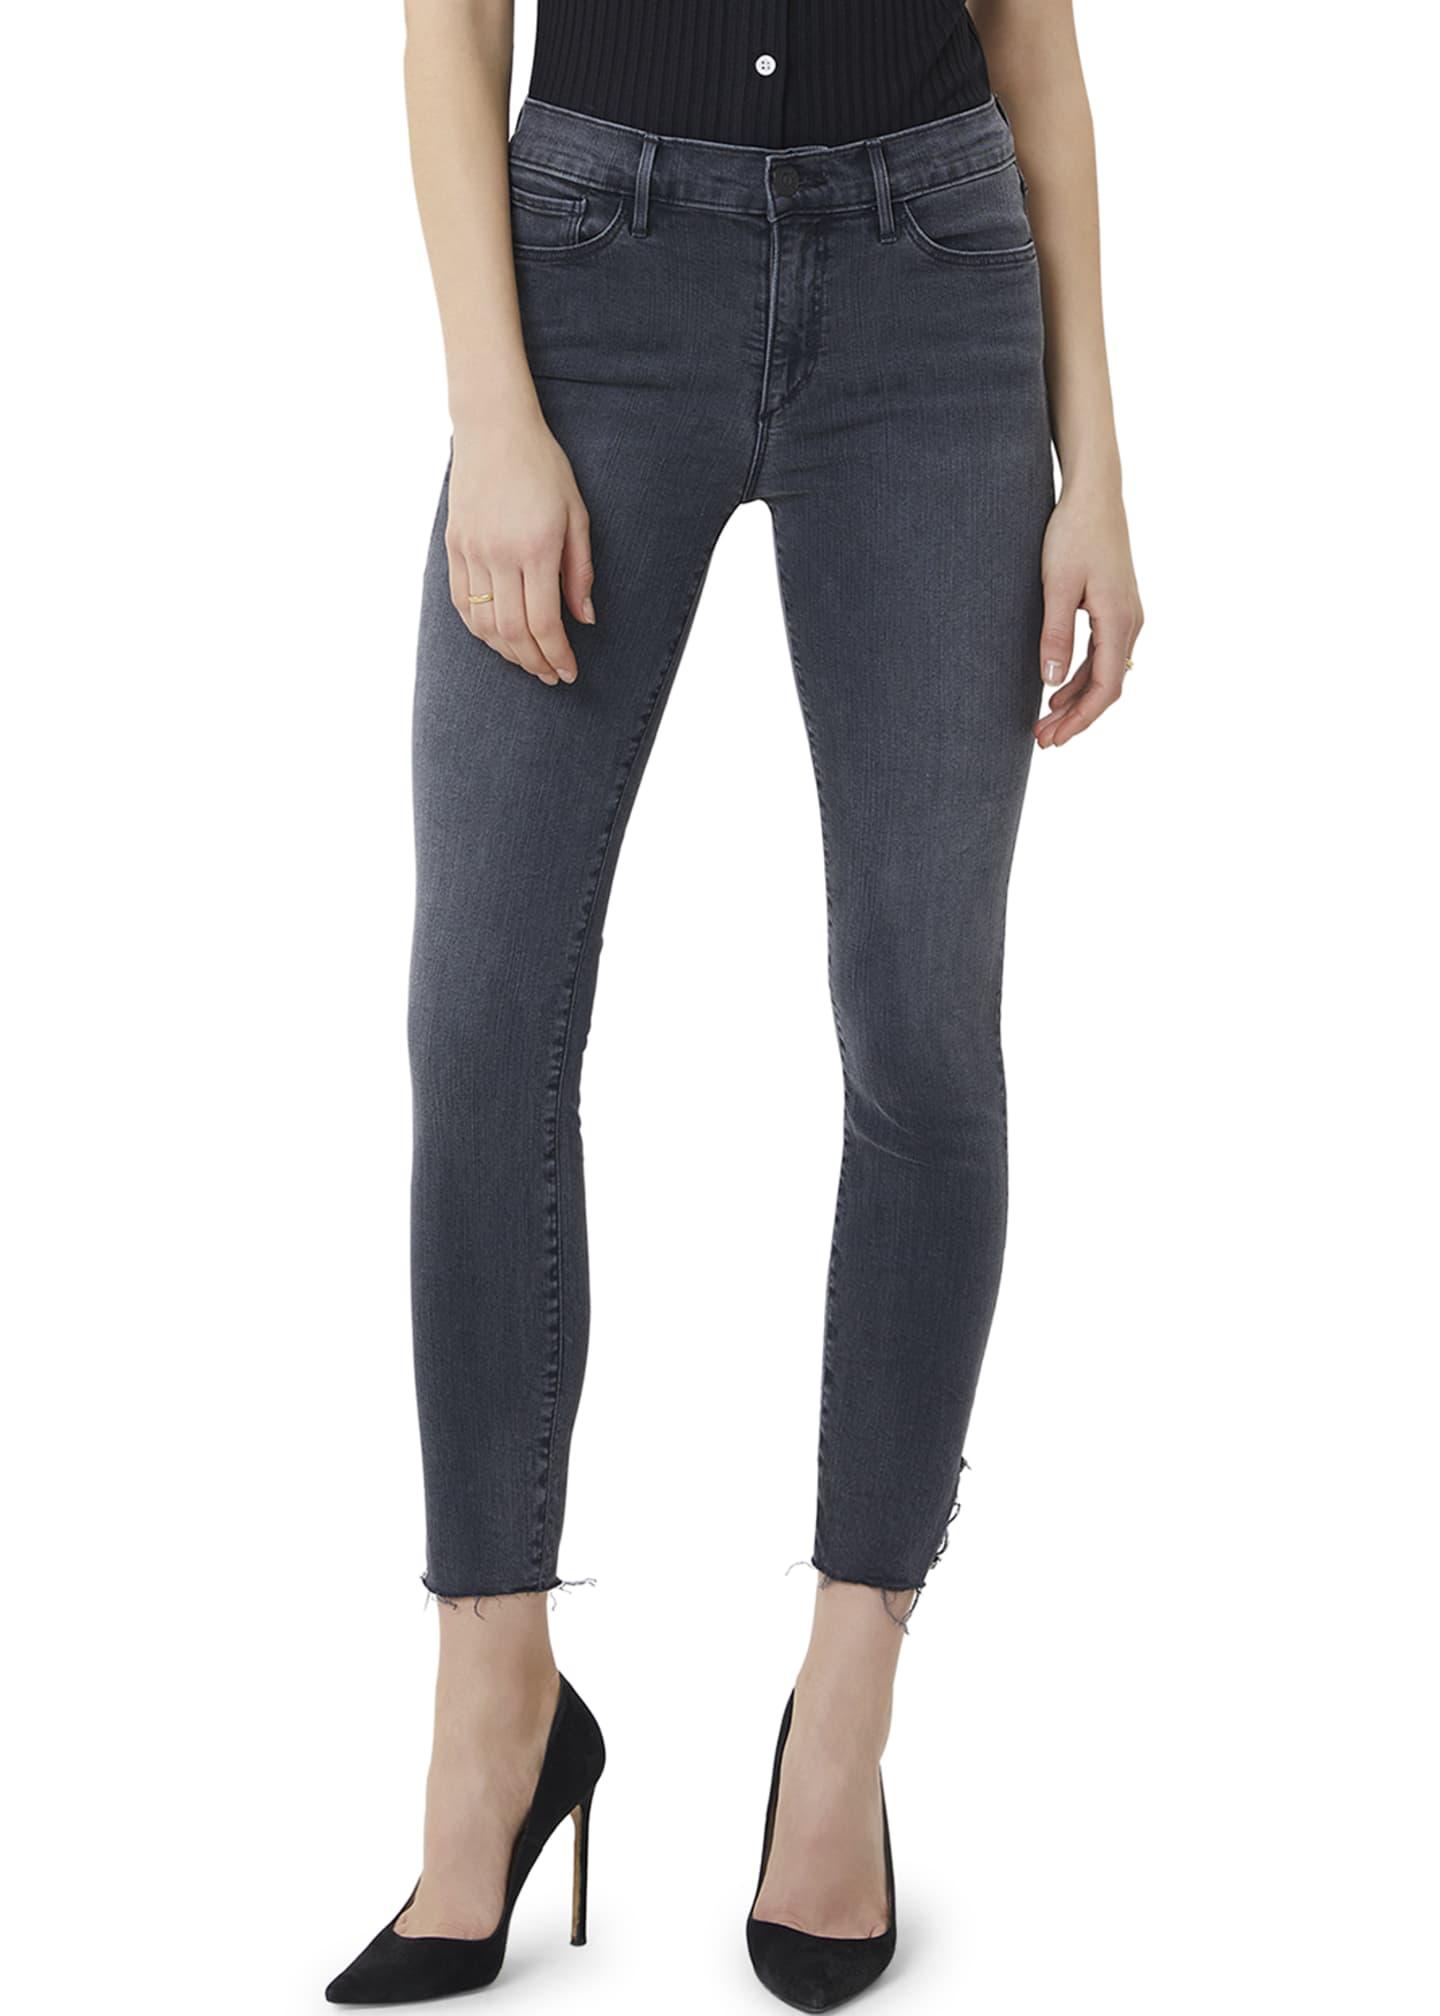 3x1 Mid-Rise Crop Skinny Jeans with Raw Hem